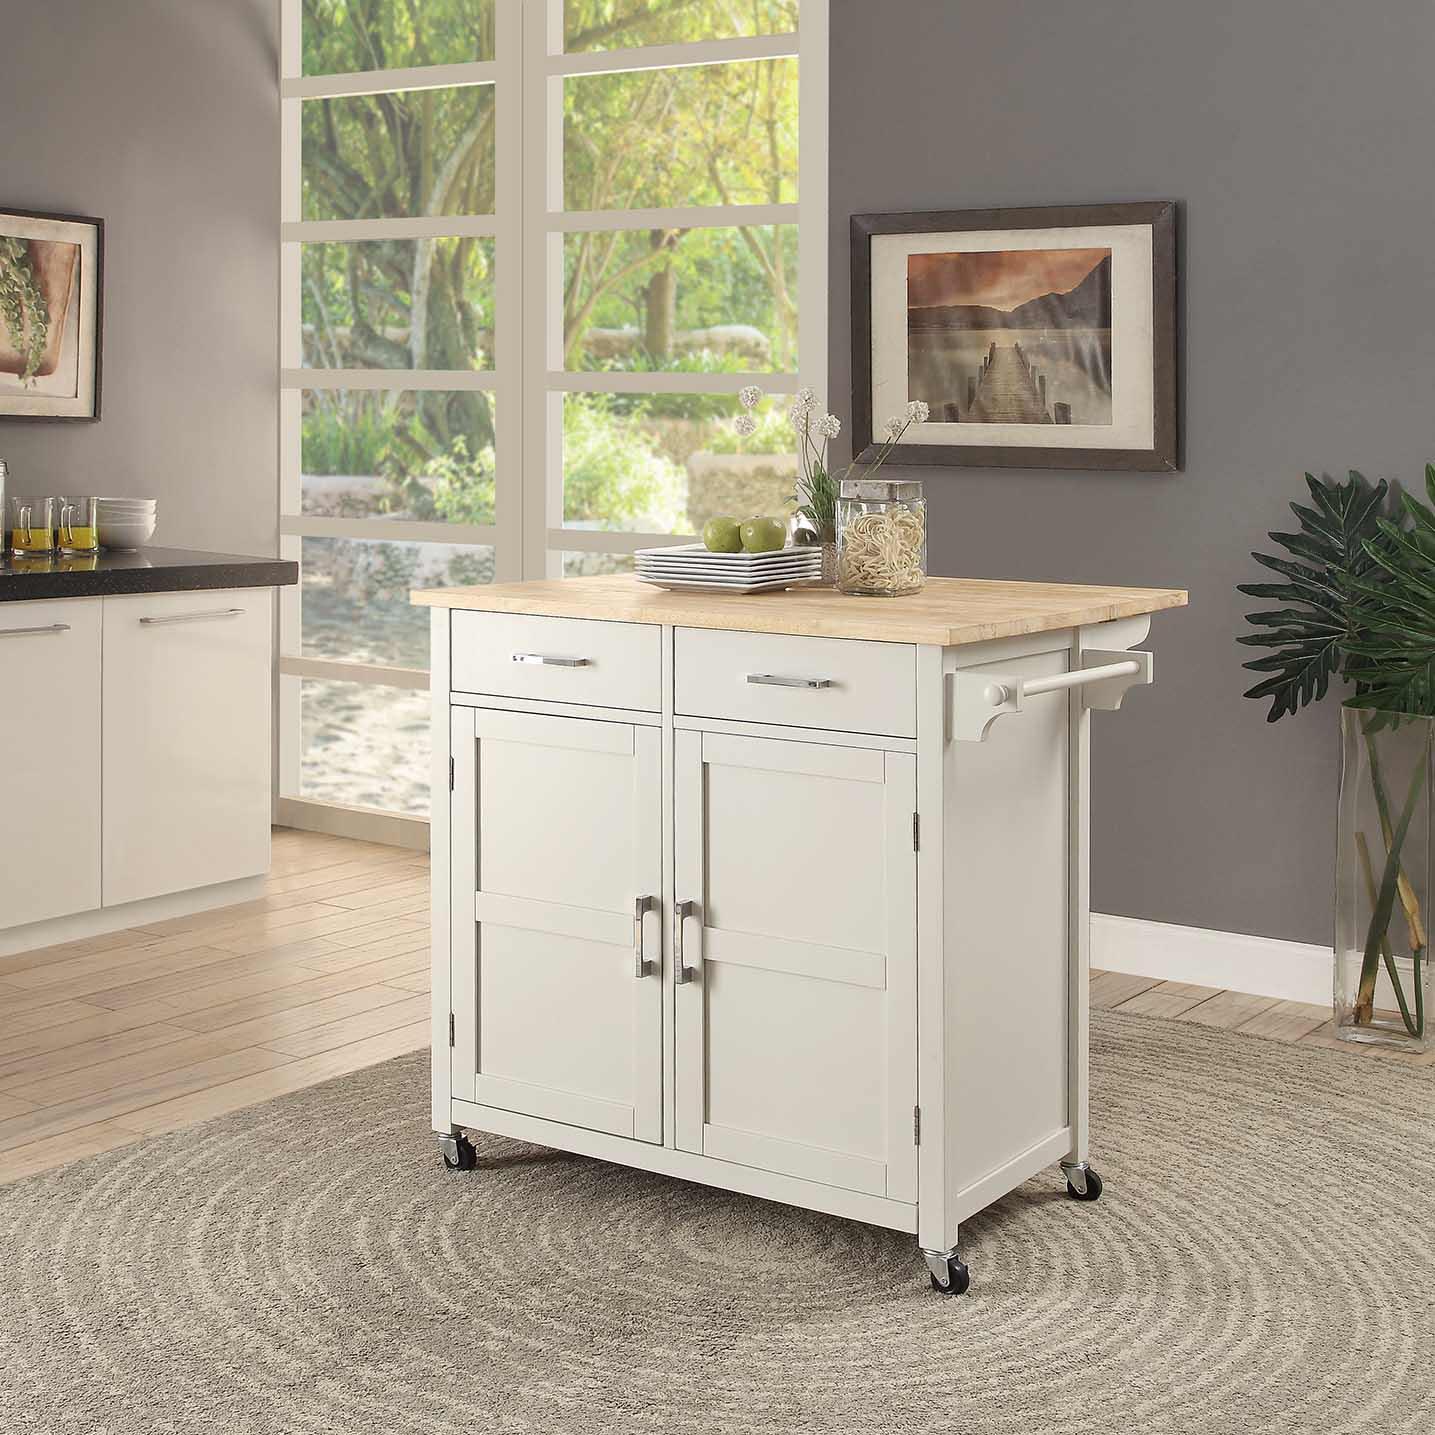 Kitchen Trolley Designs Colors: Macie Kitchen Cart White-Color:Polar White,Quantity:1